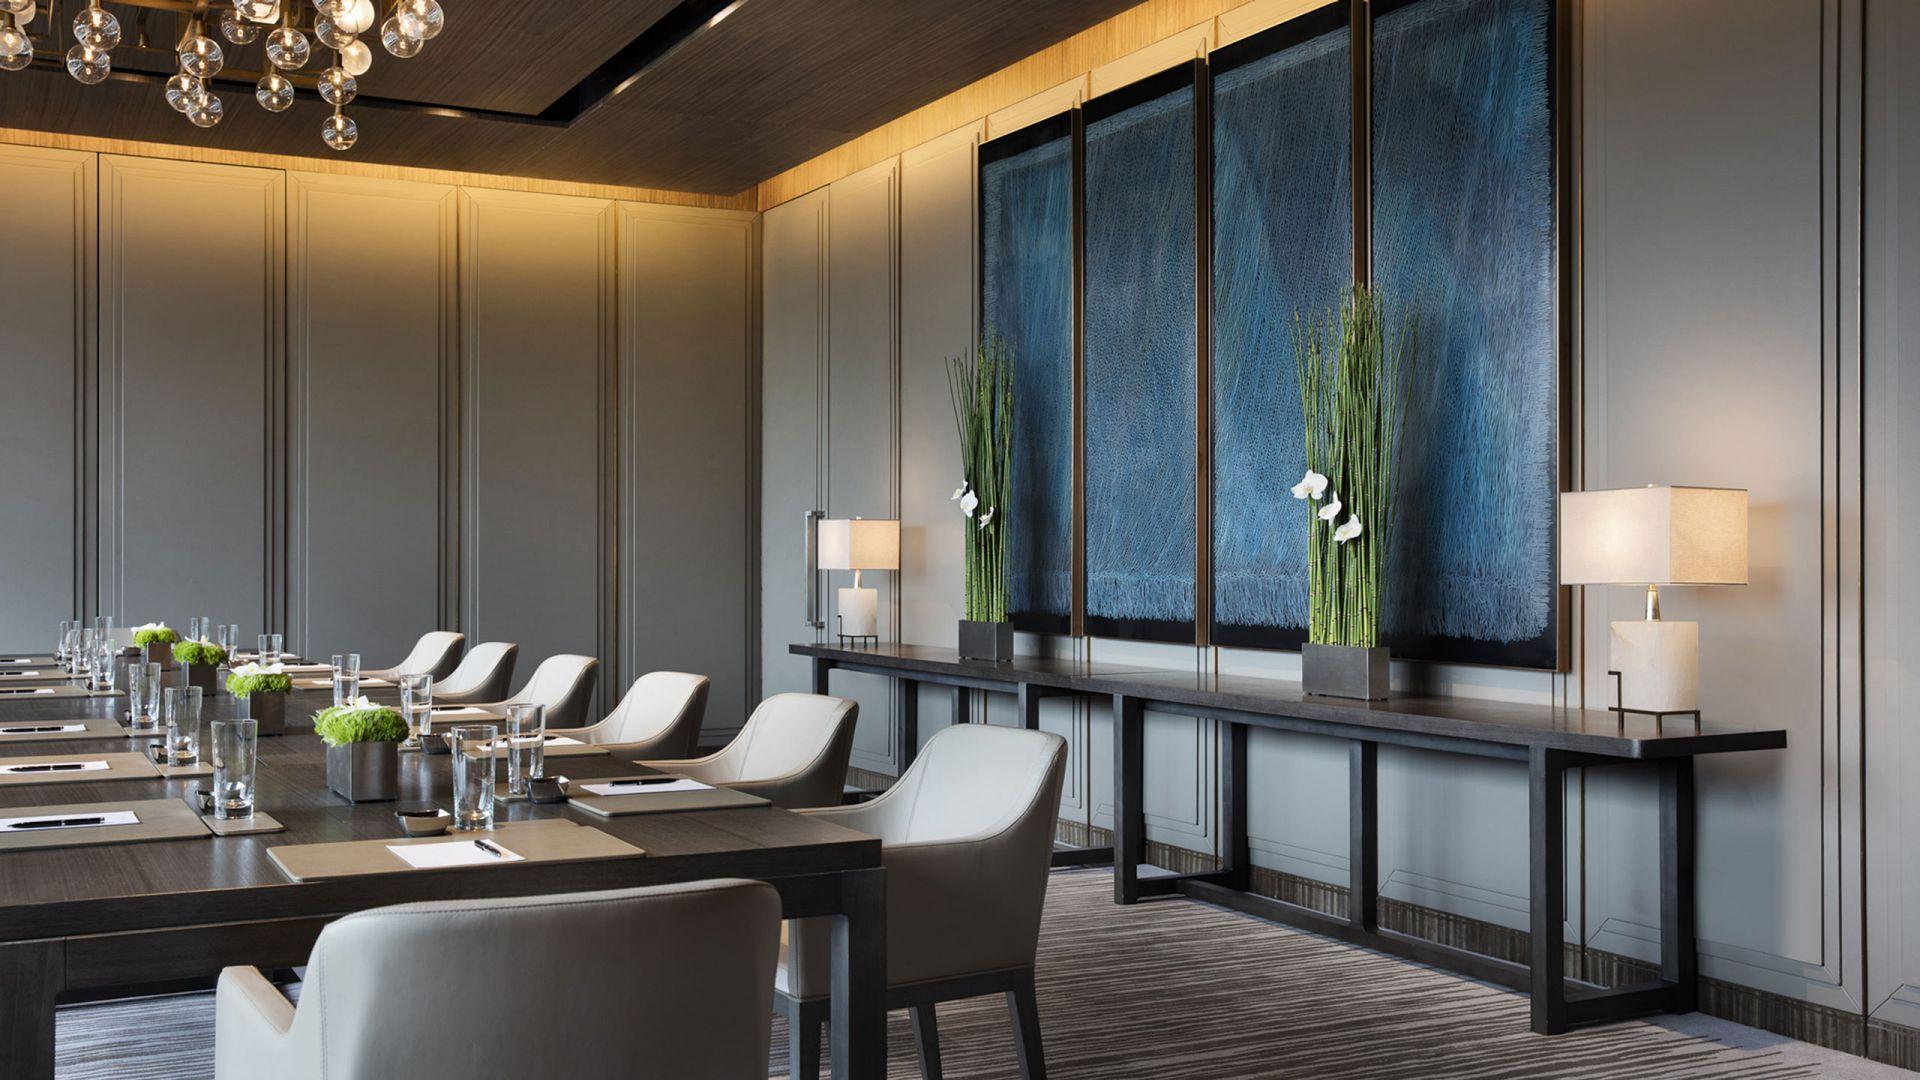 Luxury Hotel & Resorts Park Hyatt Interior design